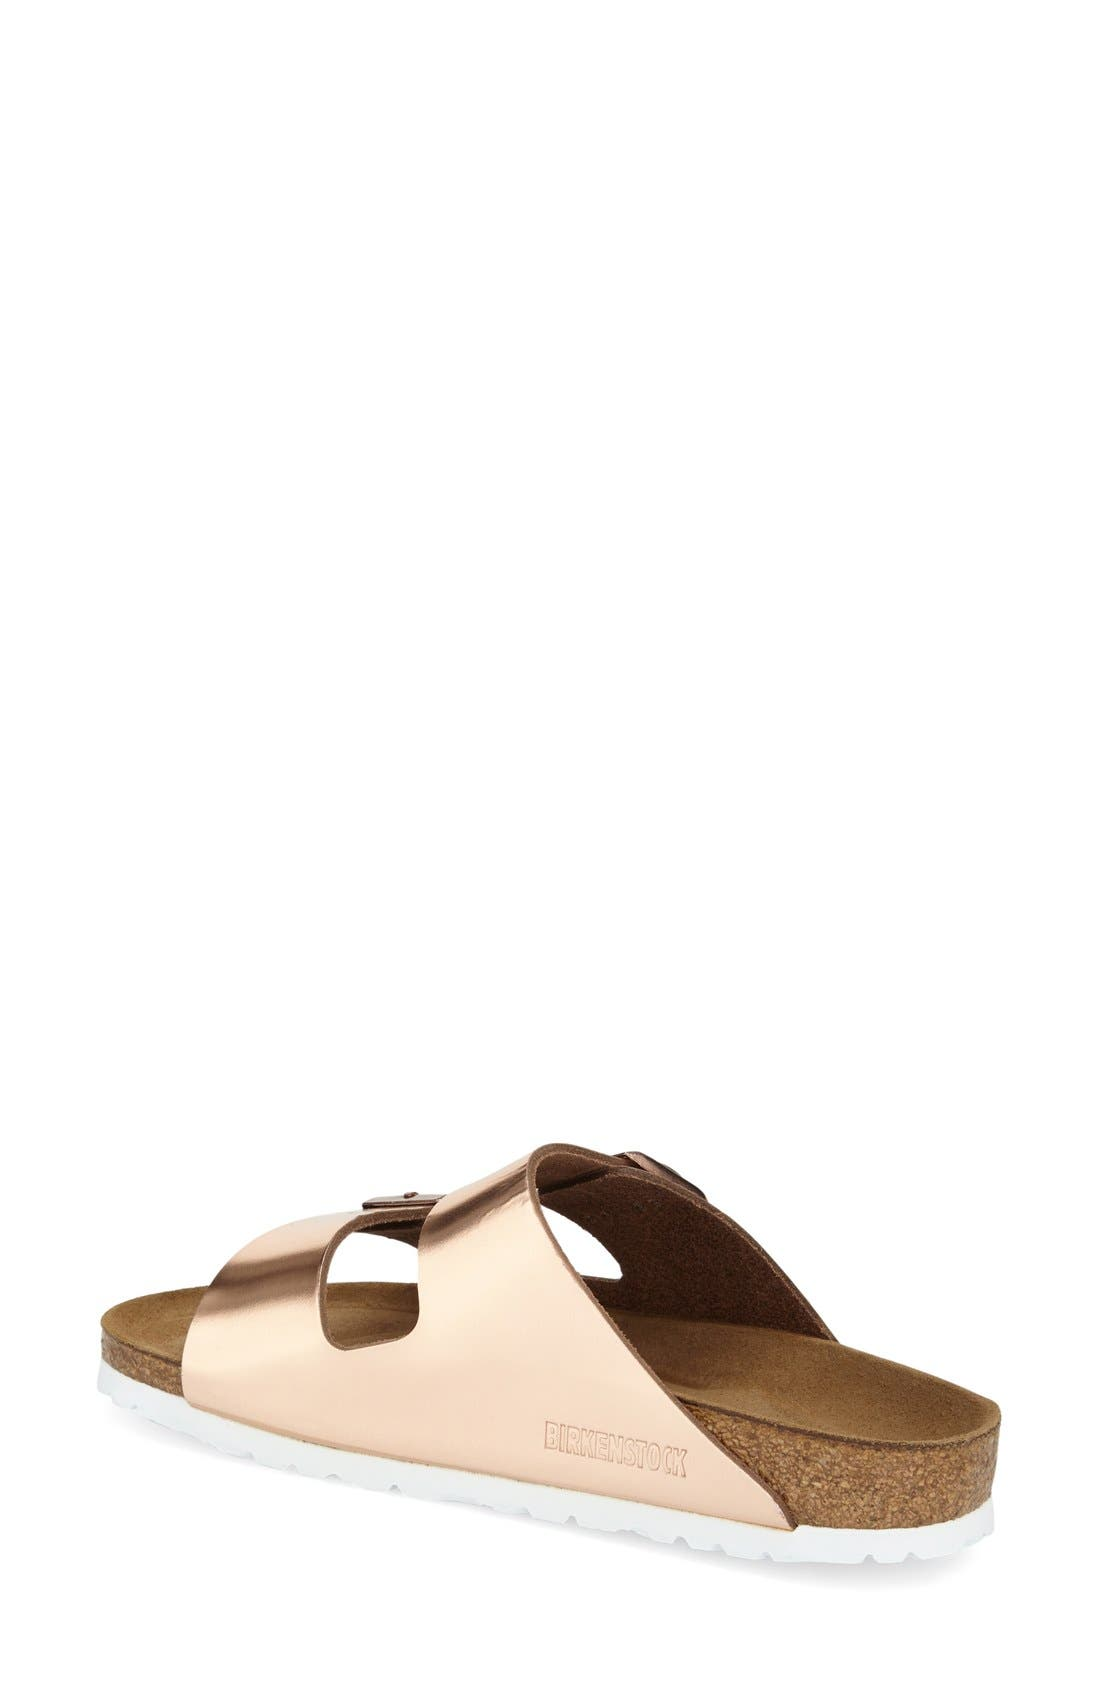 c19a1289214 Women's Mules & Slides | Nordstrom